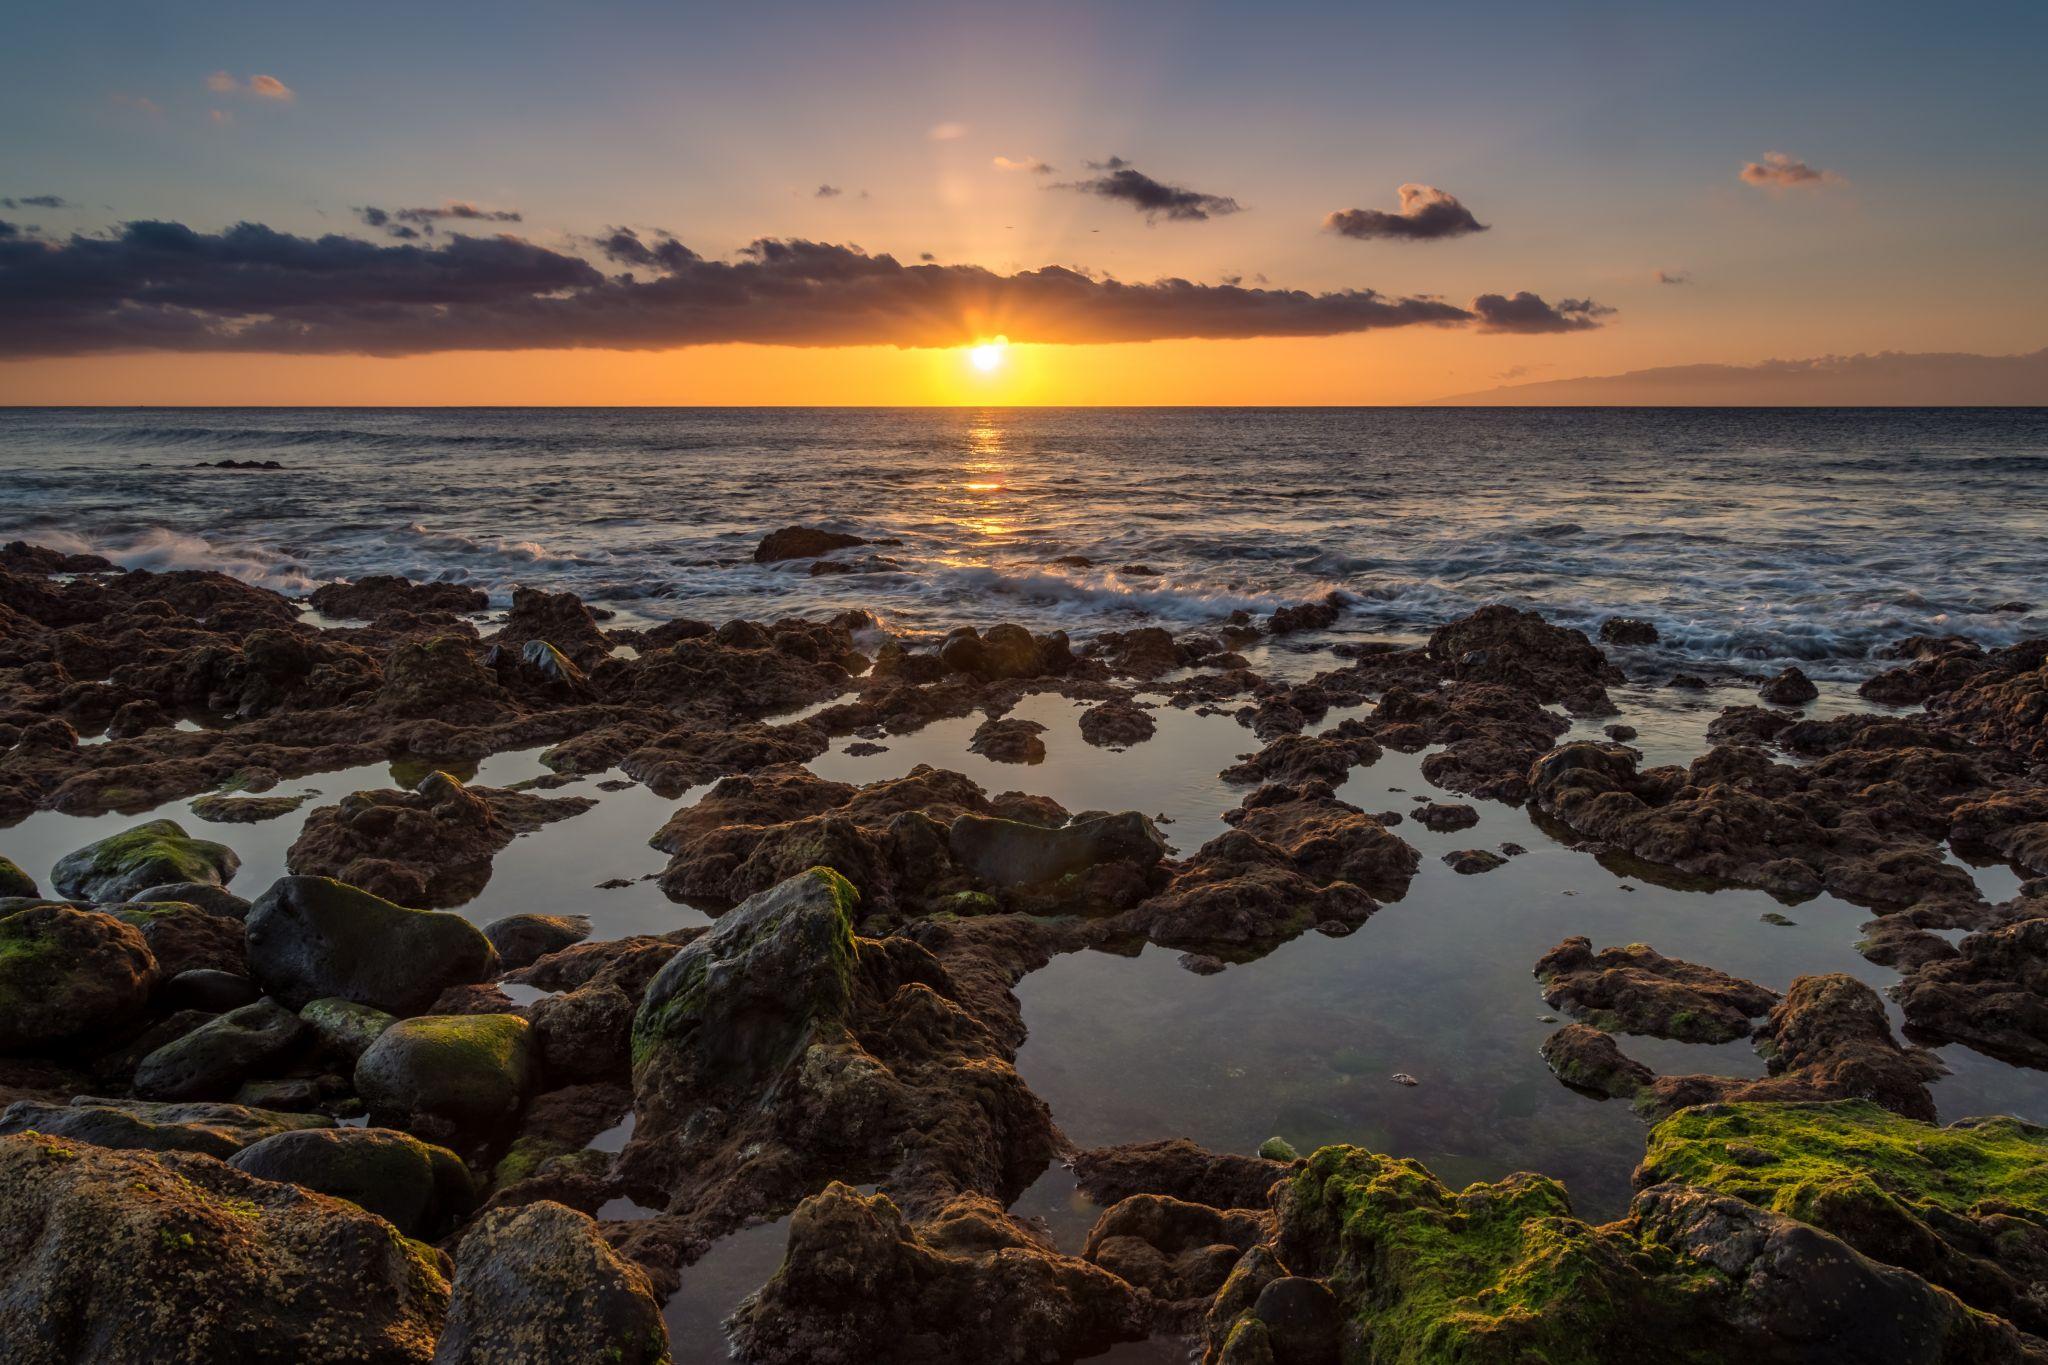 Bahia Beach Palm Mar Seascape, Spain